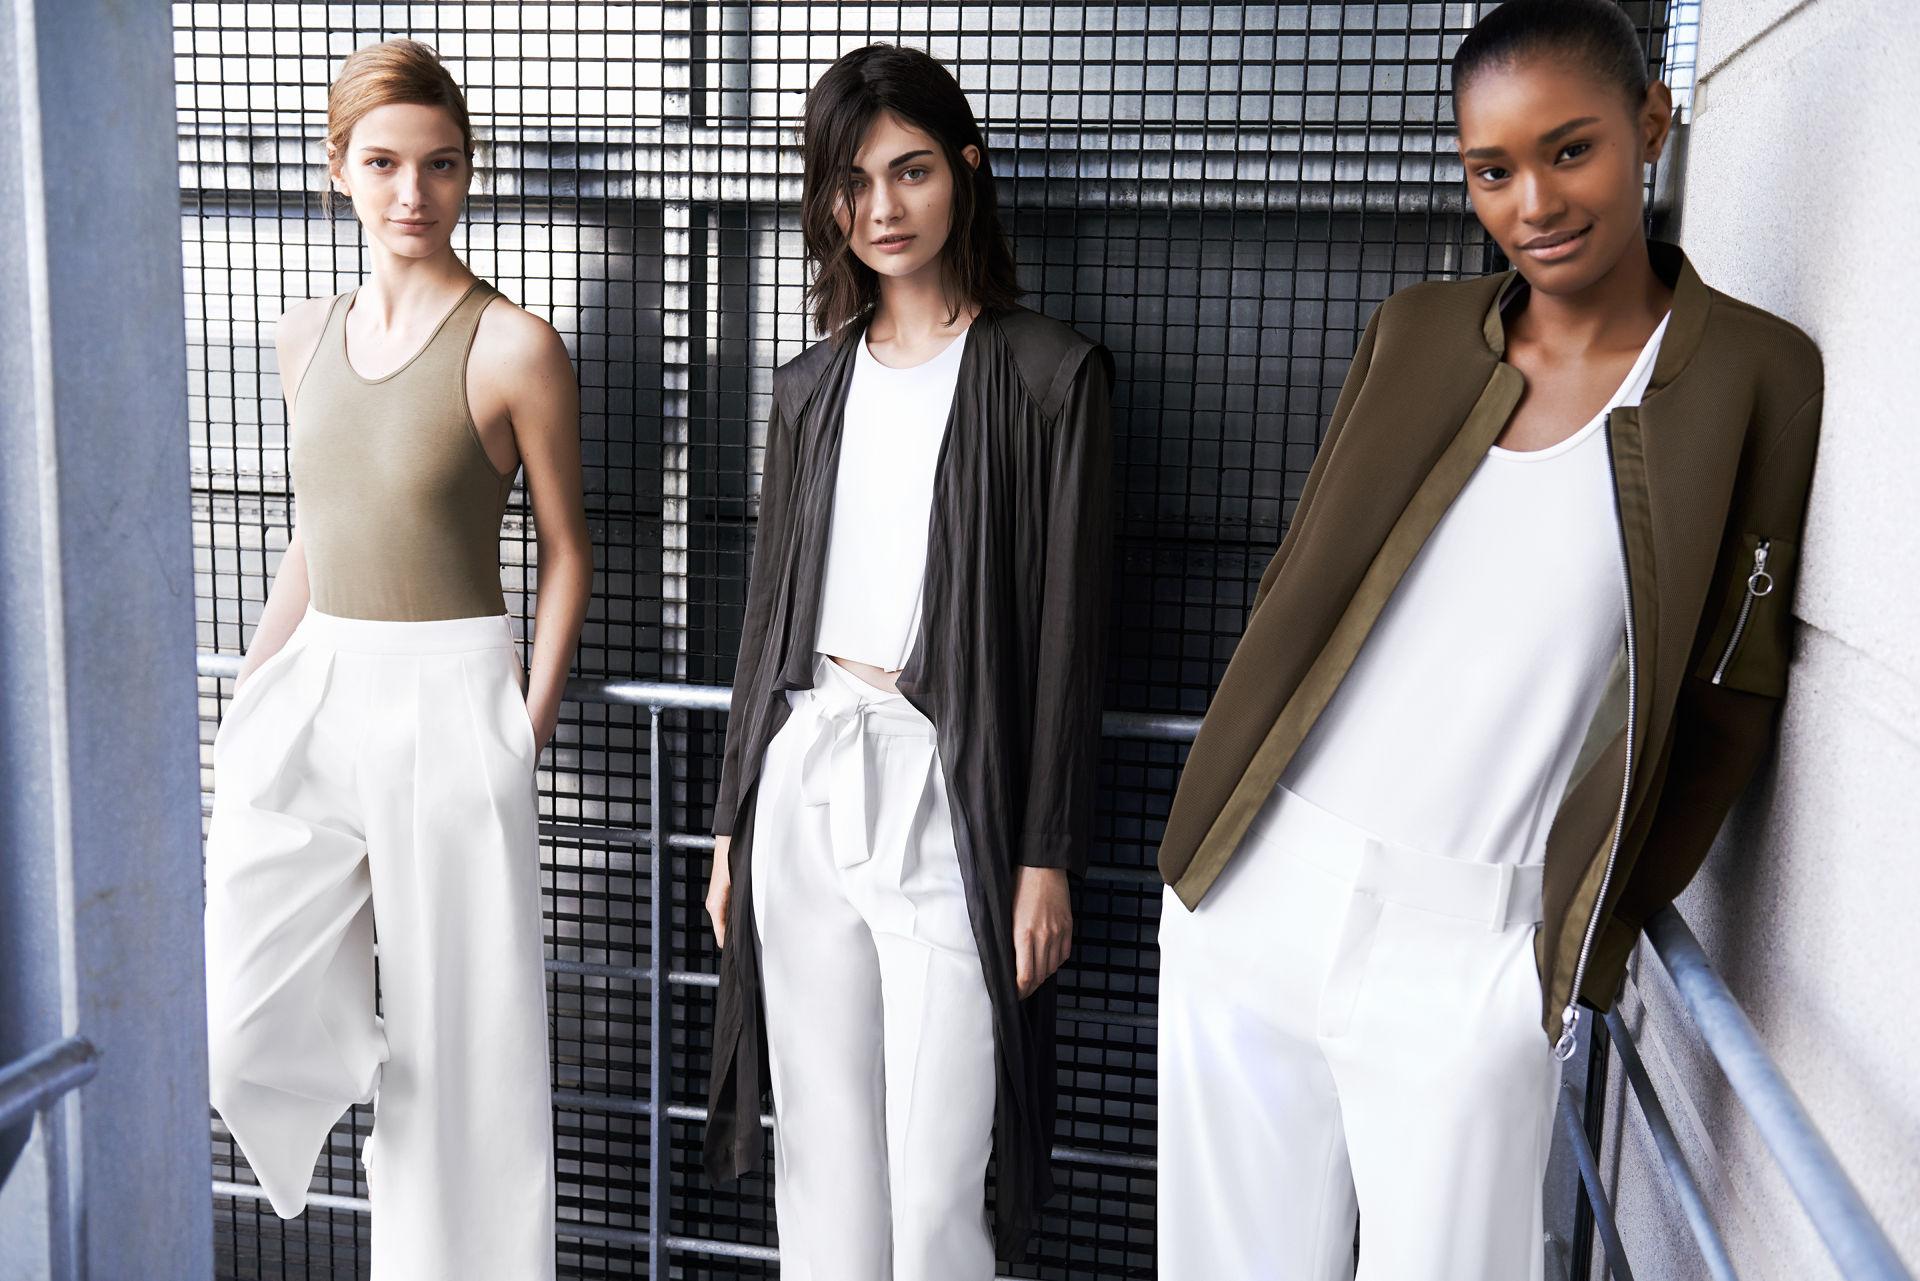 Zara-Woman-april-may-lookbbok-8